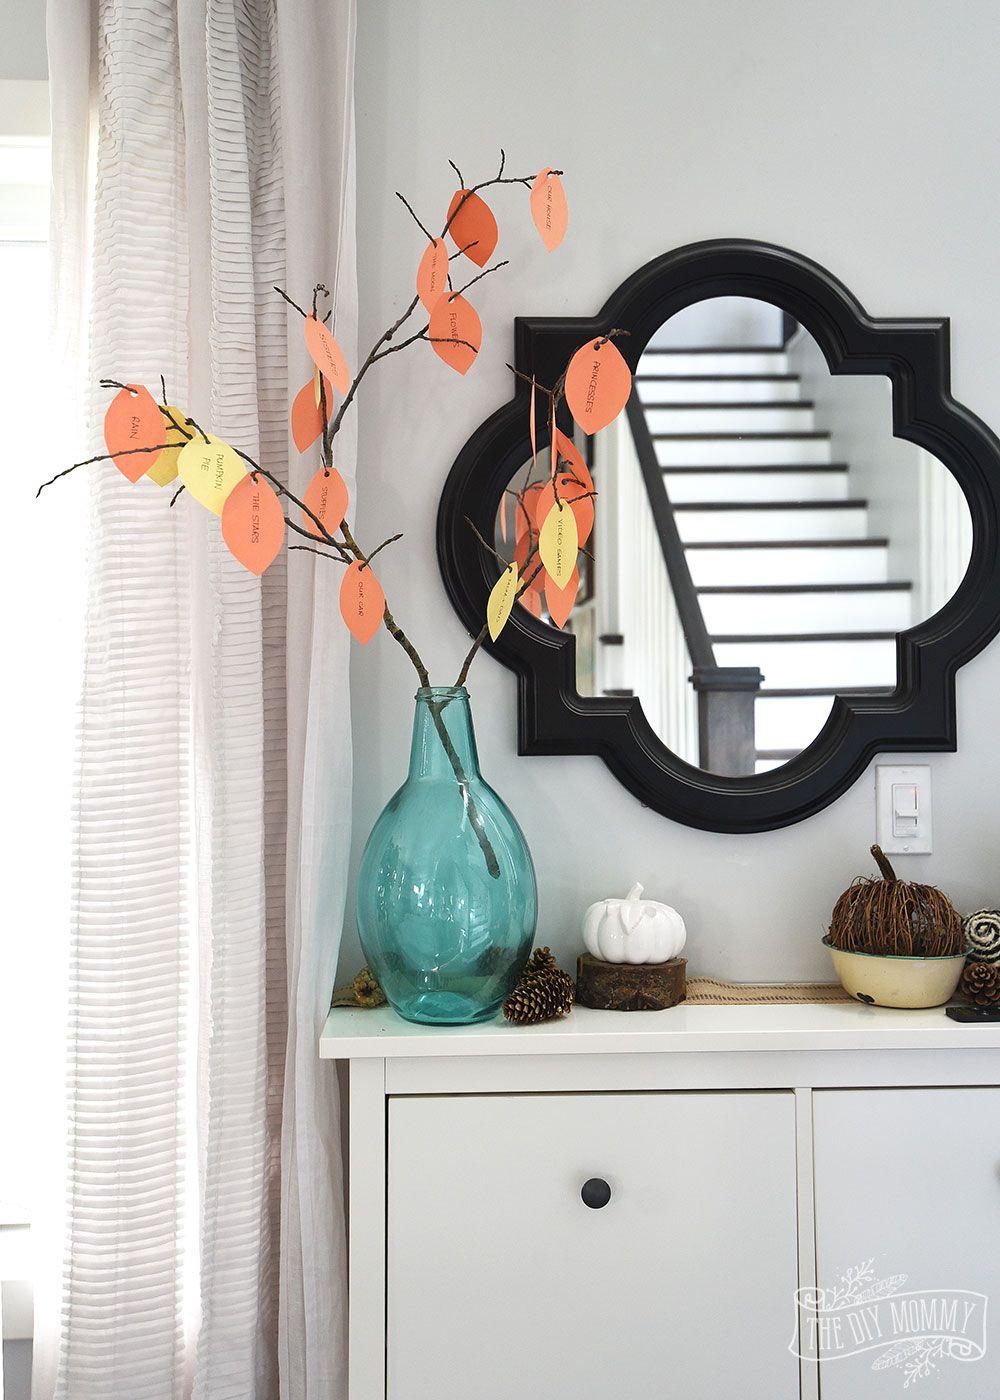 Make a Thankful Tree A Thankgiving Kid's Craft Tip